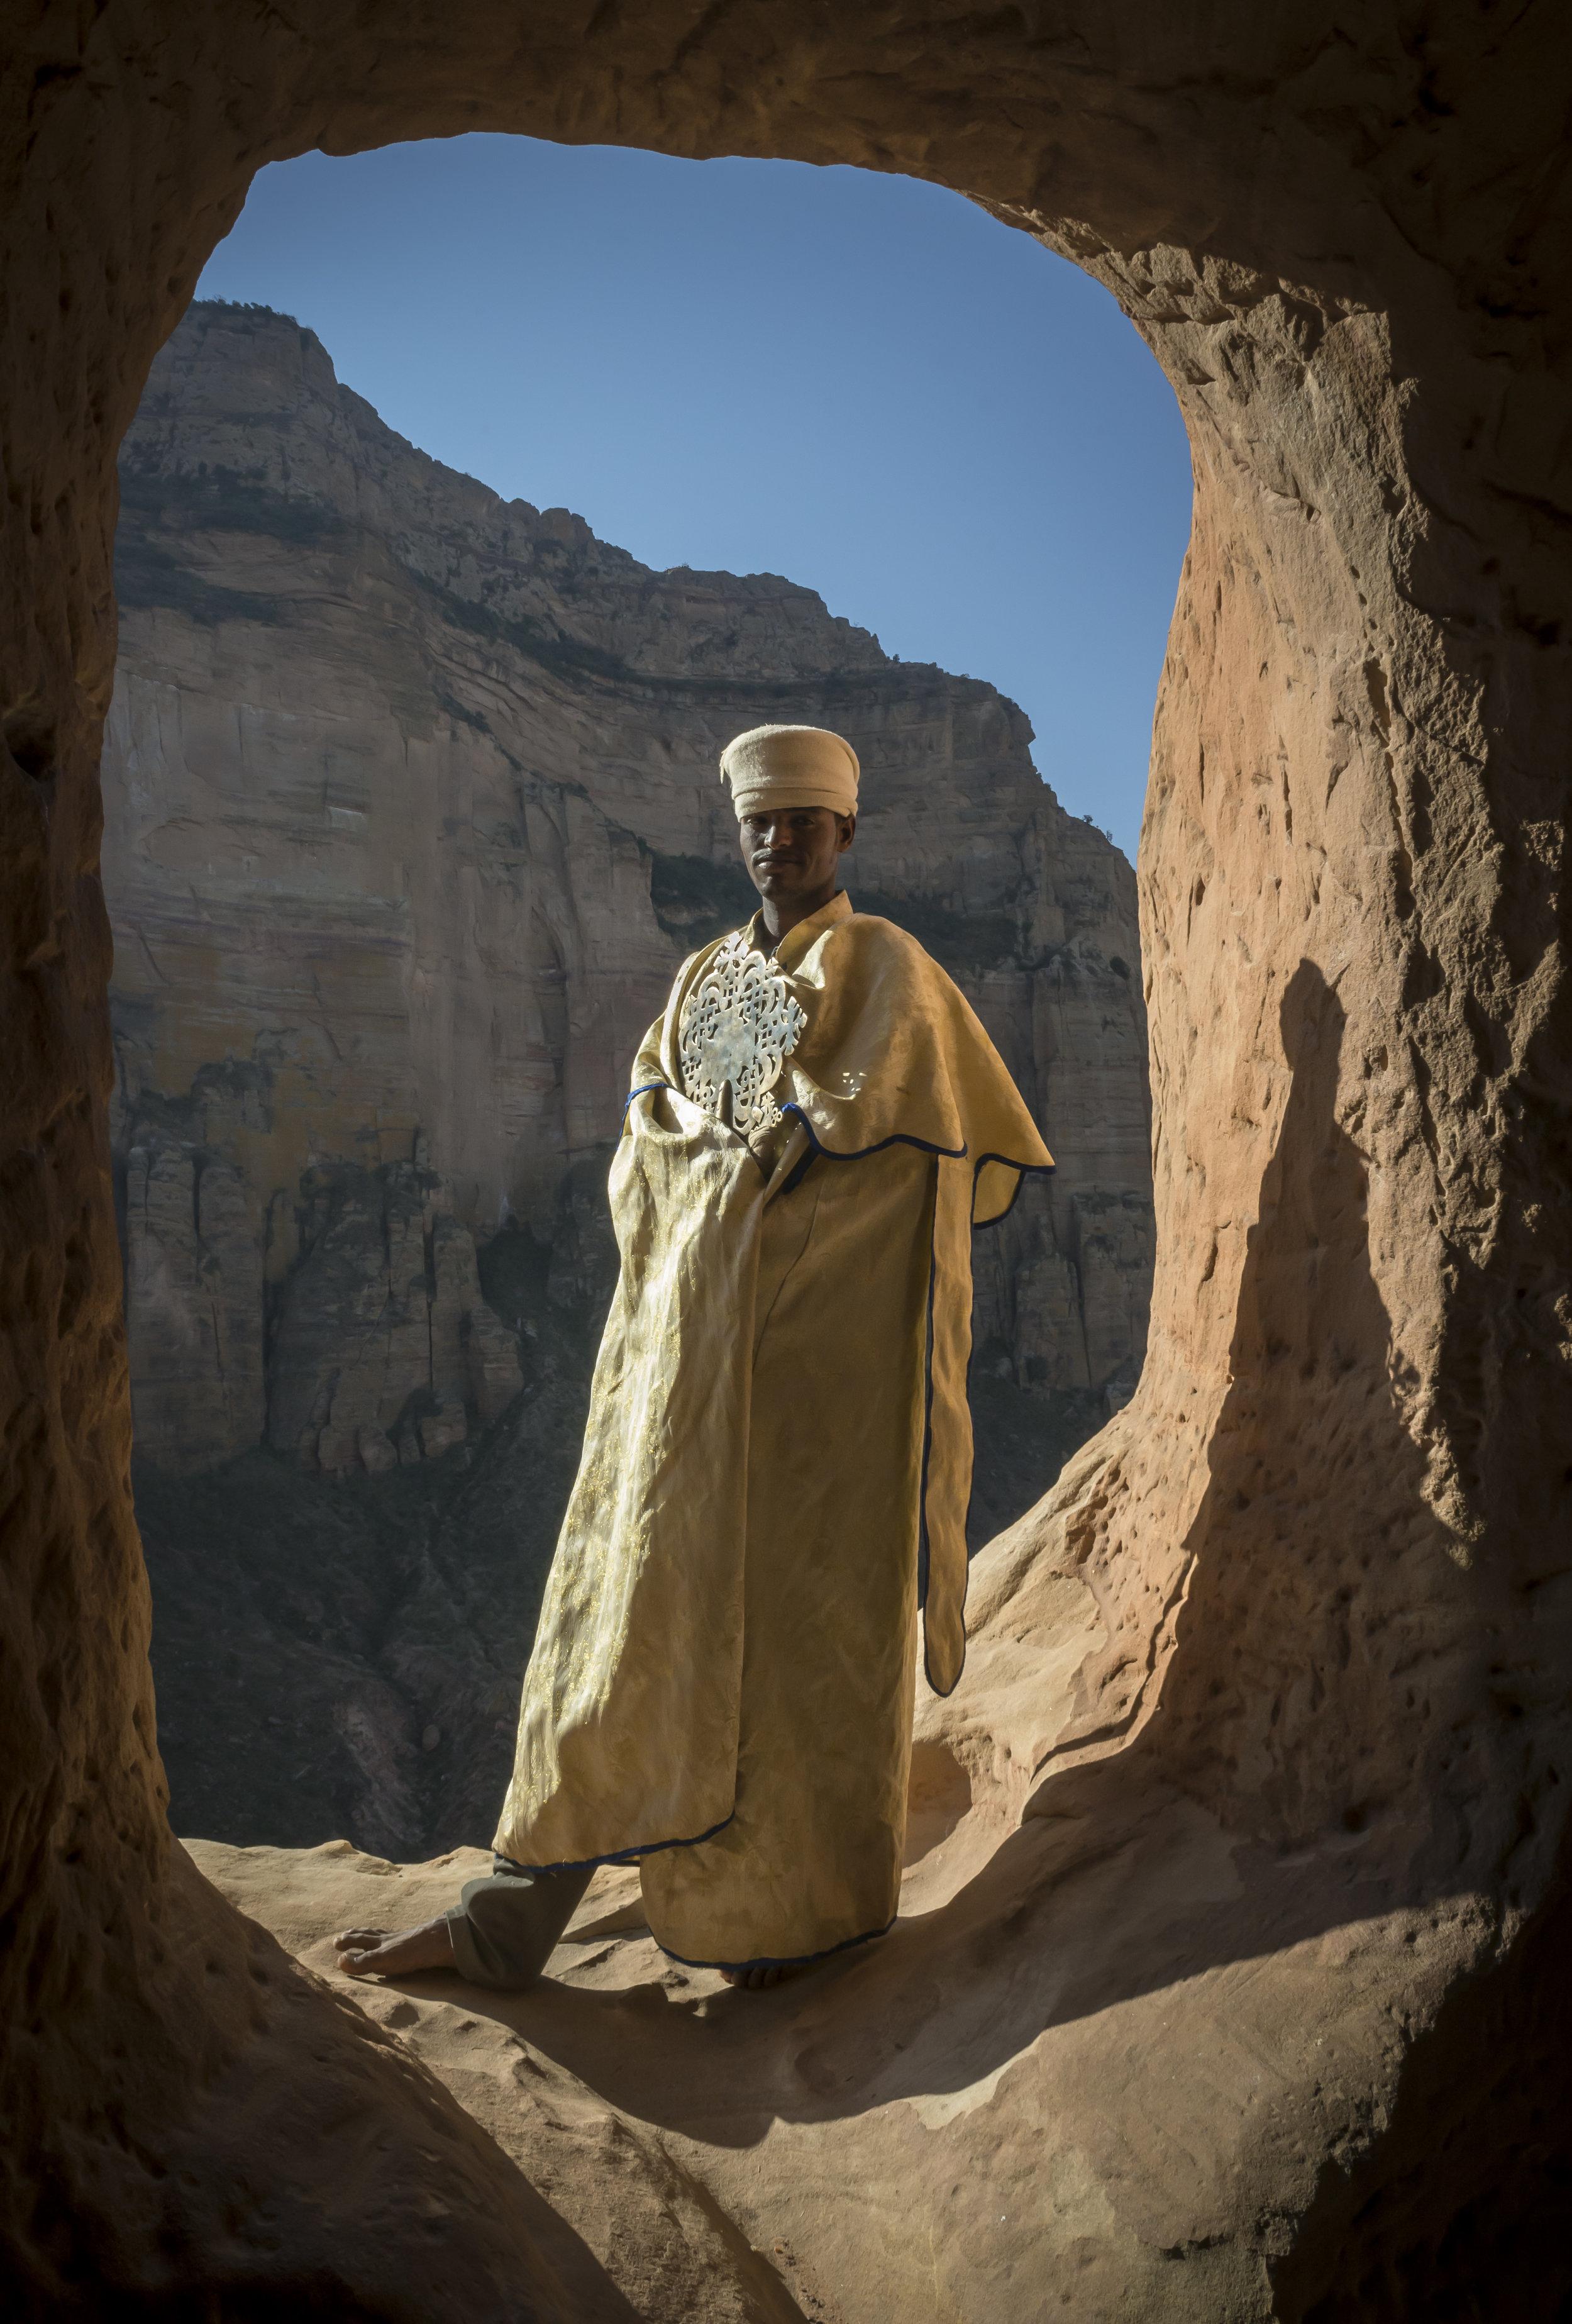 An Ethiopian Christian priest . Photo by Chris Roche.